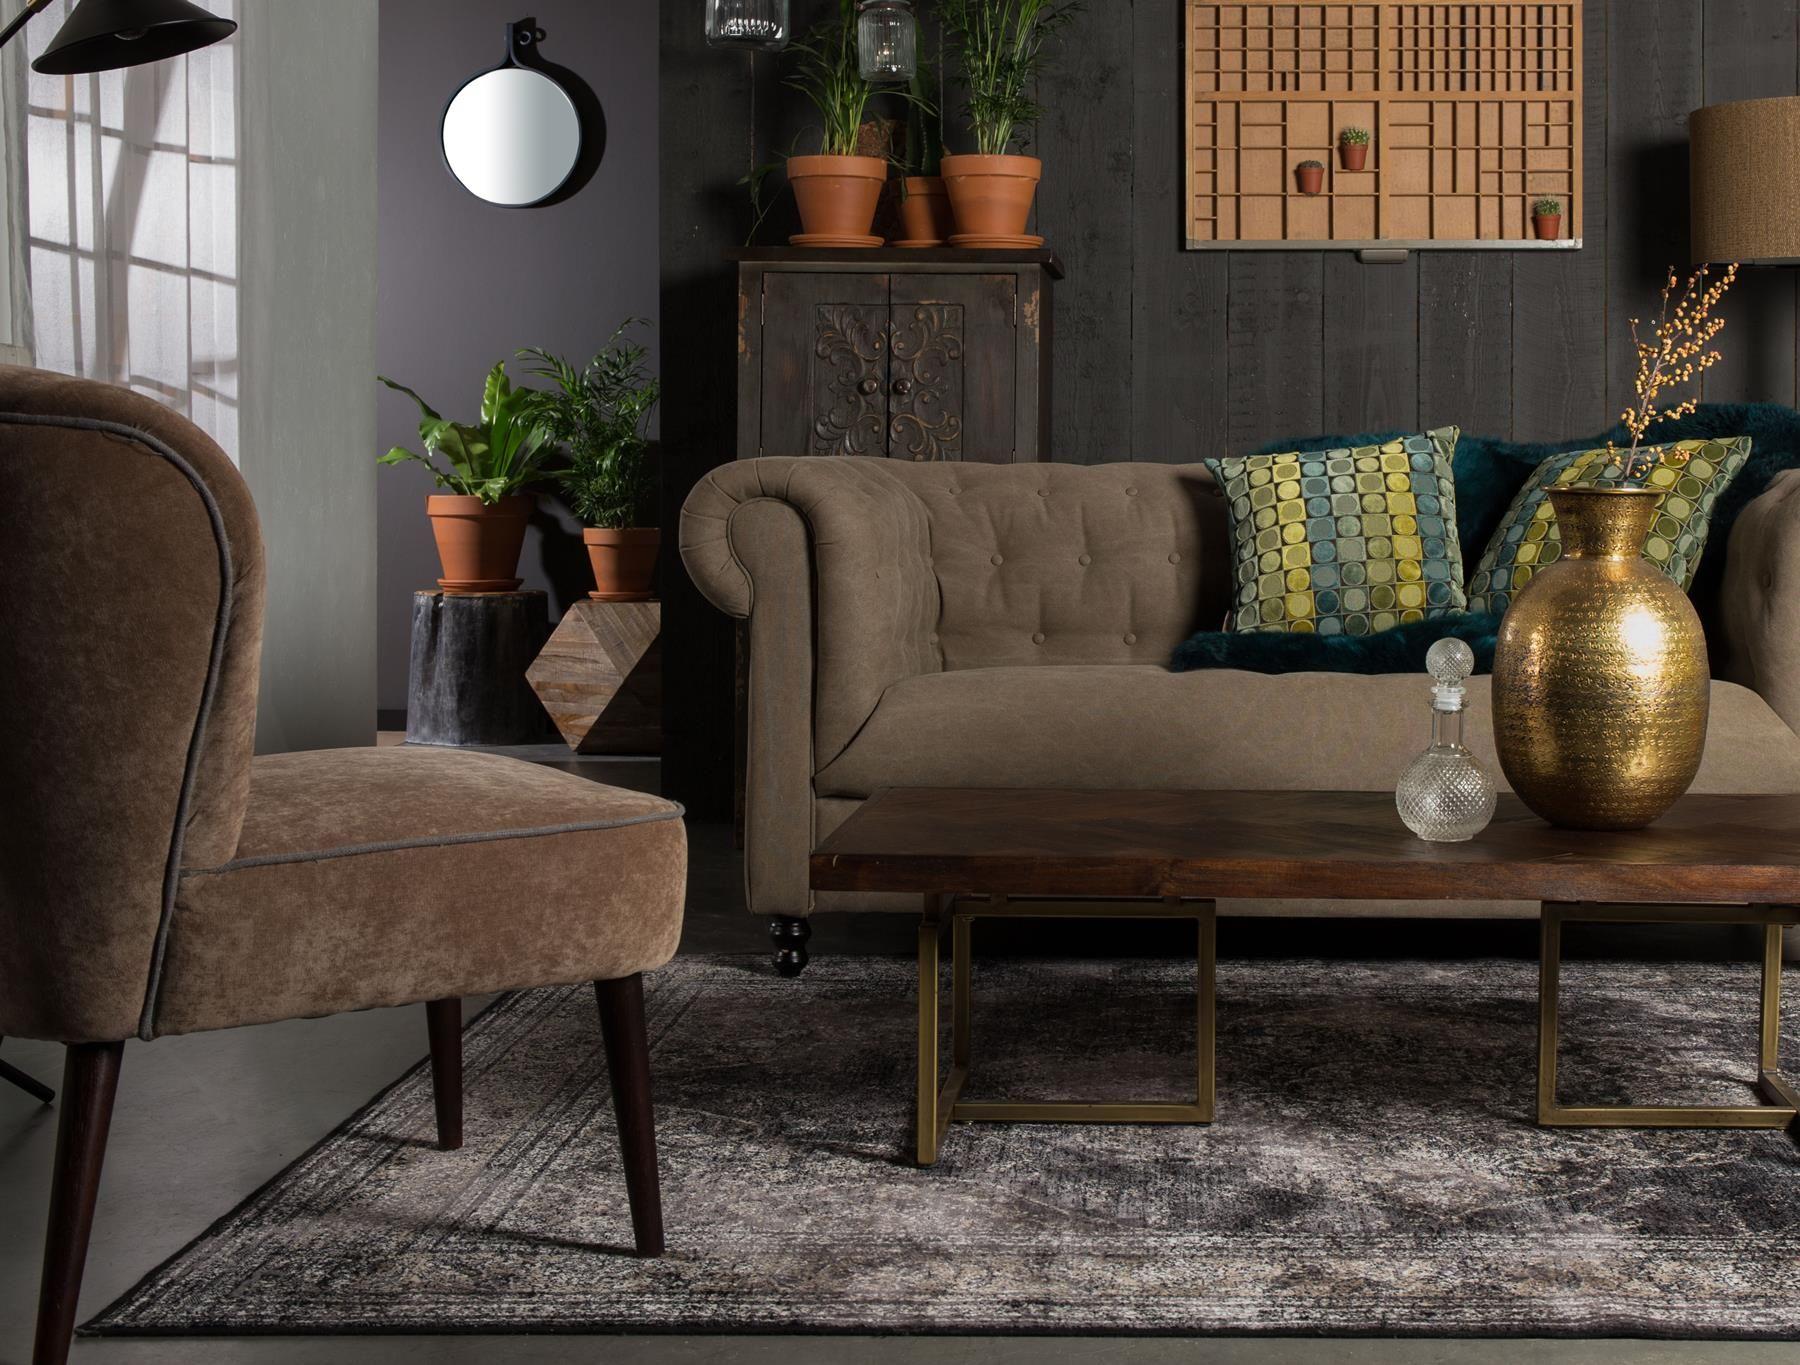 Charme Donkere Interieurs : Interieur 2017 pinterest luxury living interior en room